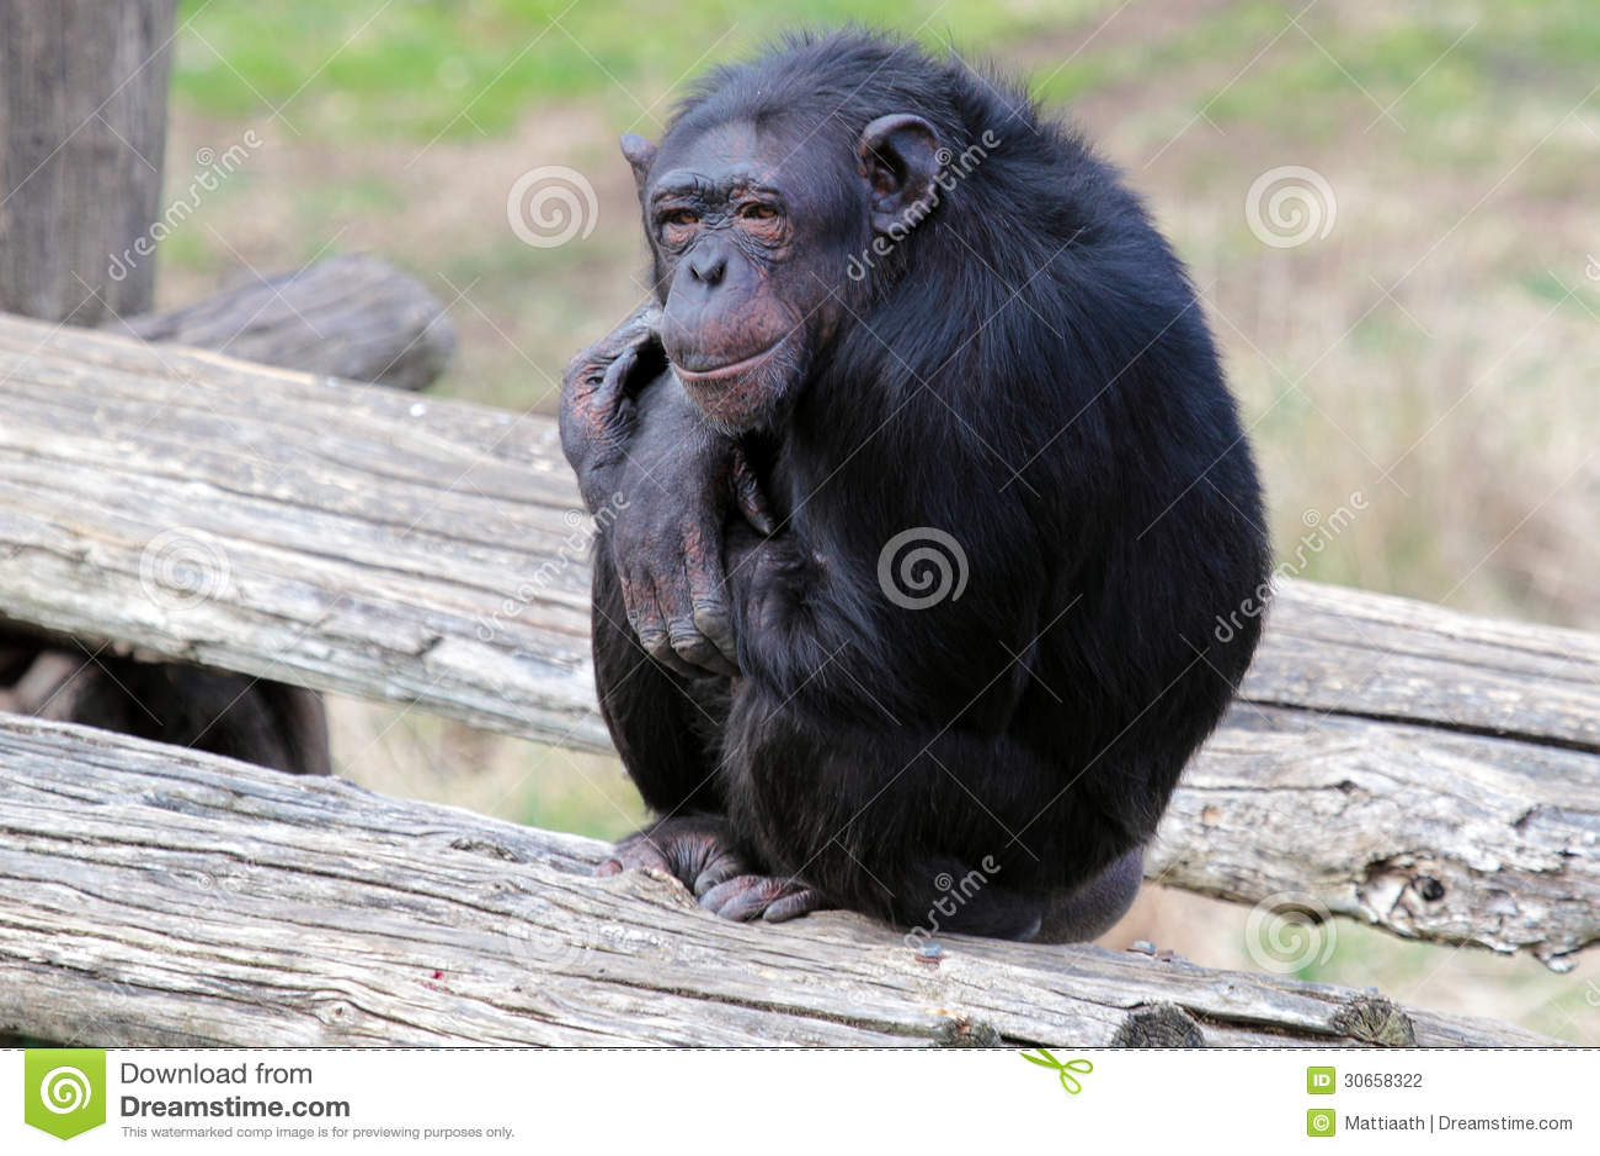 Chimp Sitting On Grass Stock Images - Image: 17599034  |Chimp Sitting